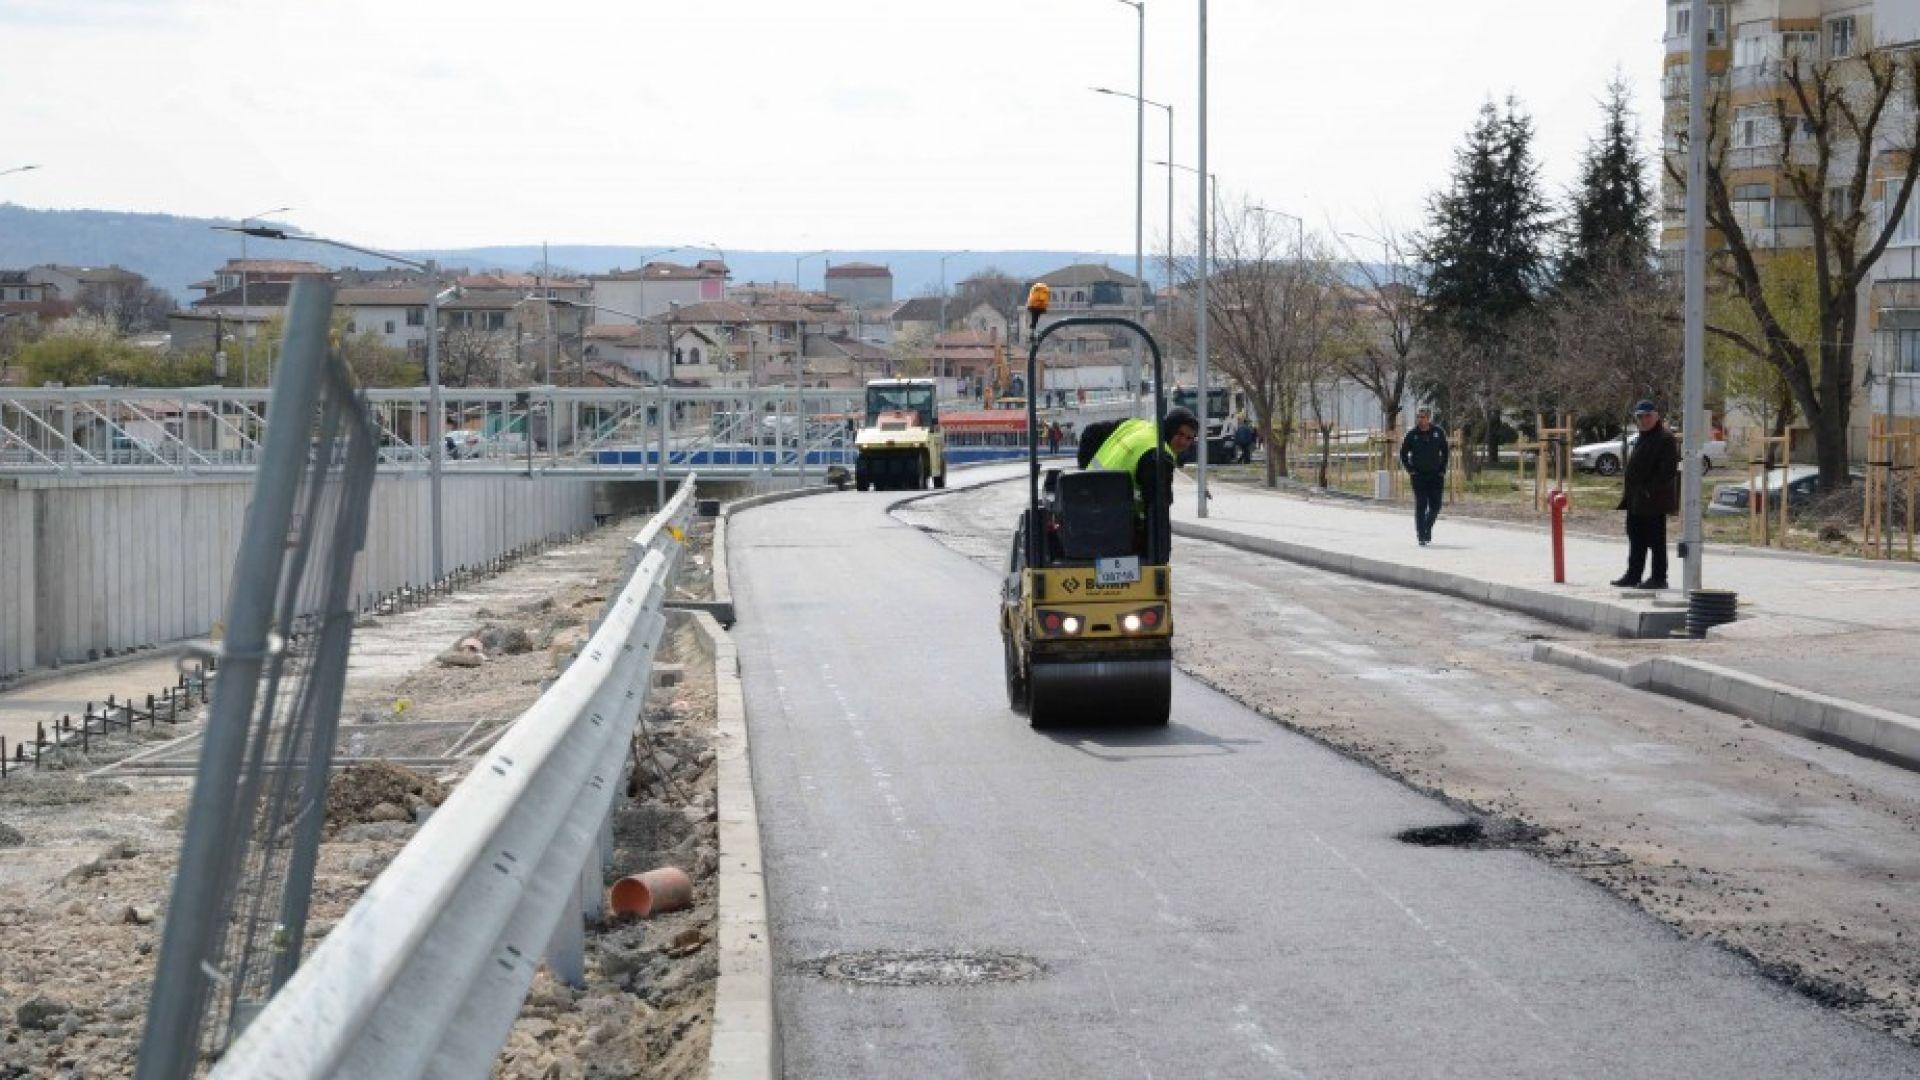 Снимка: Изграждат пешеходни пасарелки по новия бул. Васил Левски